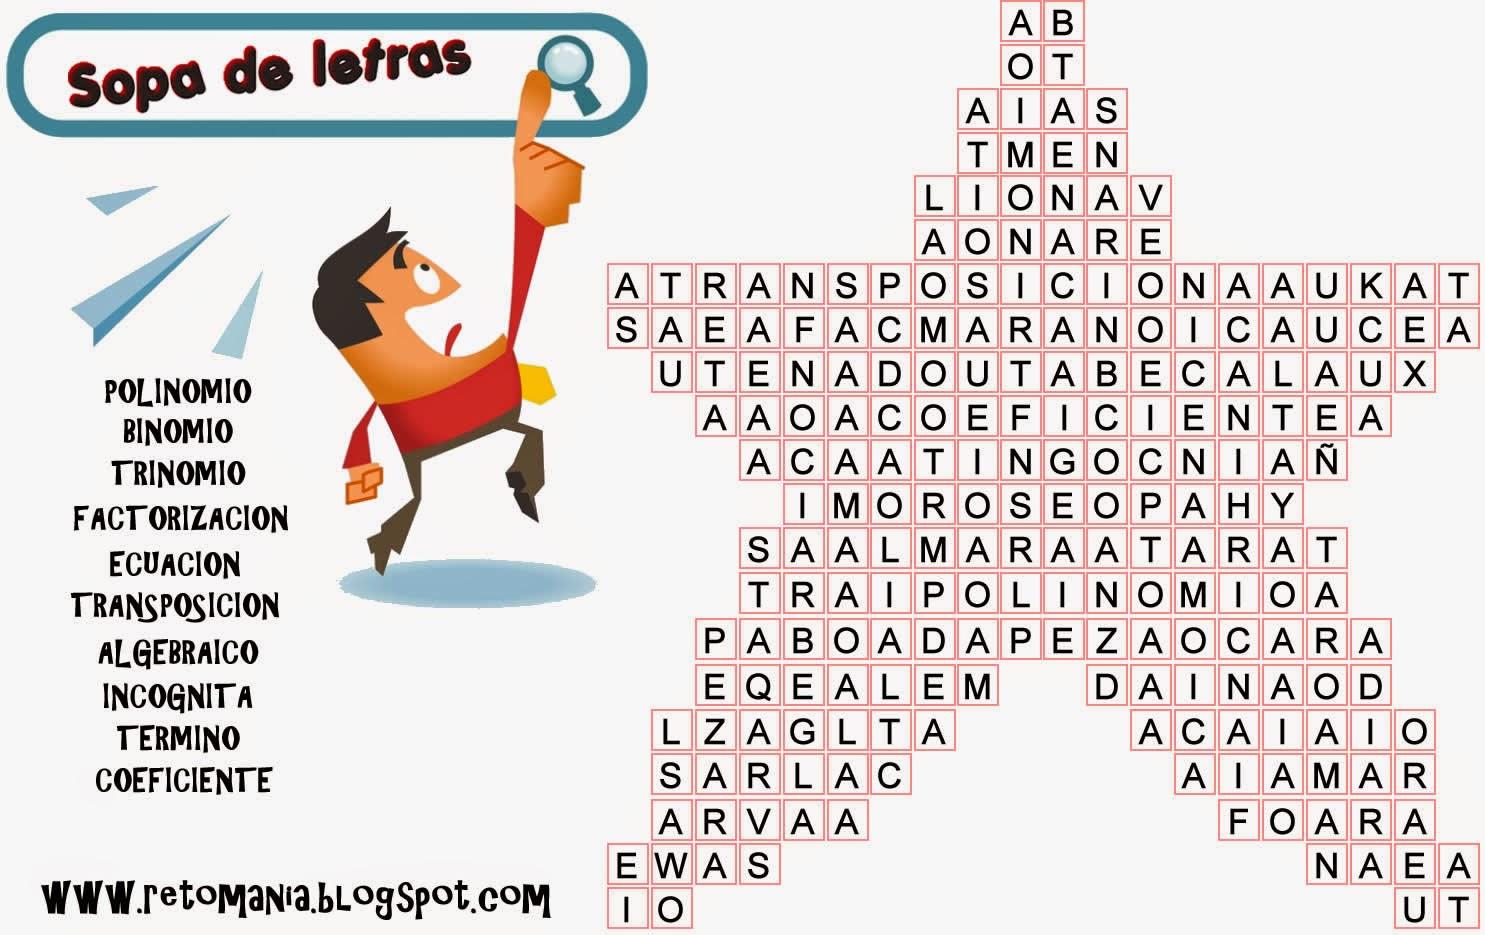 Sopa de letras, Algebra, Sopa de letras algebraica